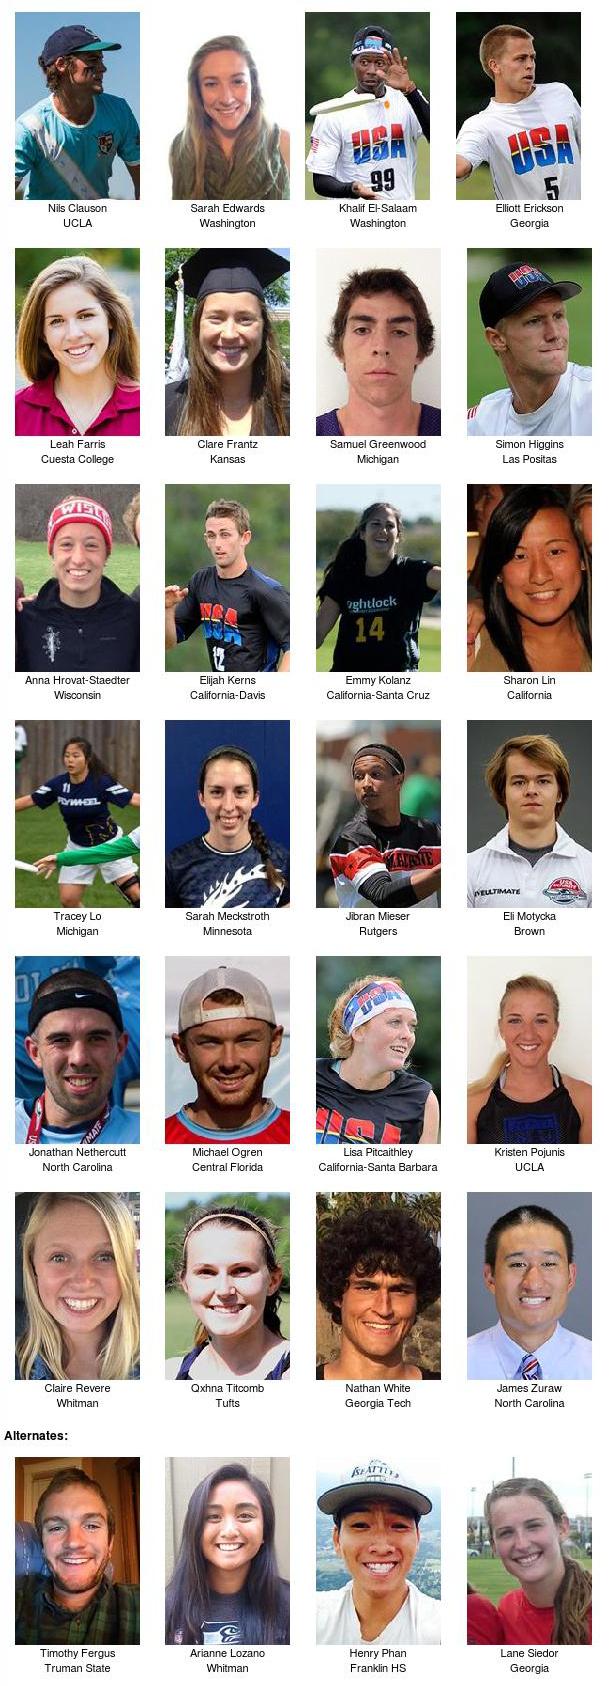 2015 U23 Mixed Division -- Team USA